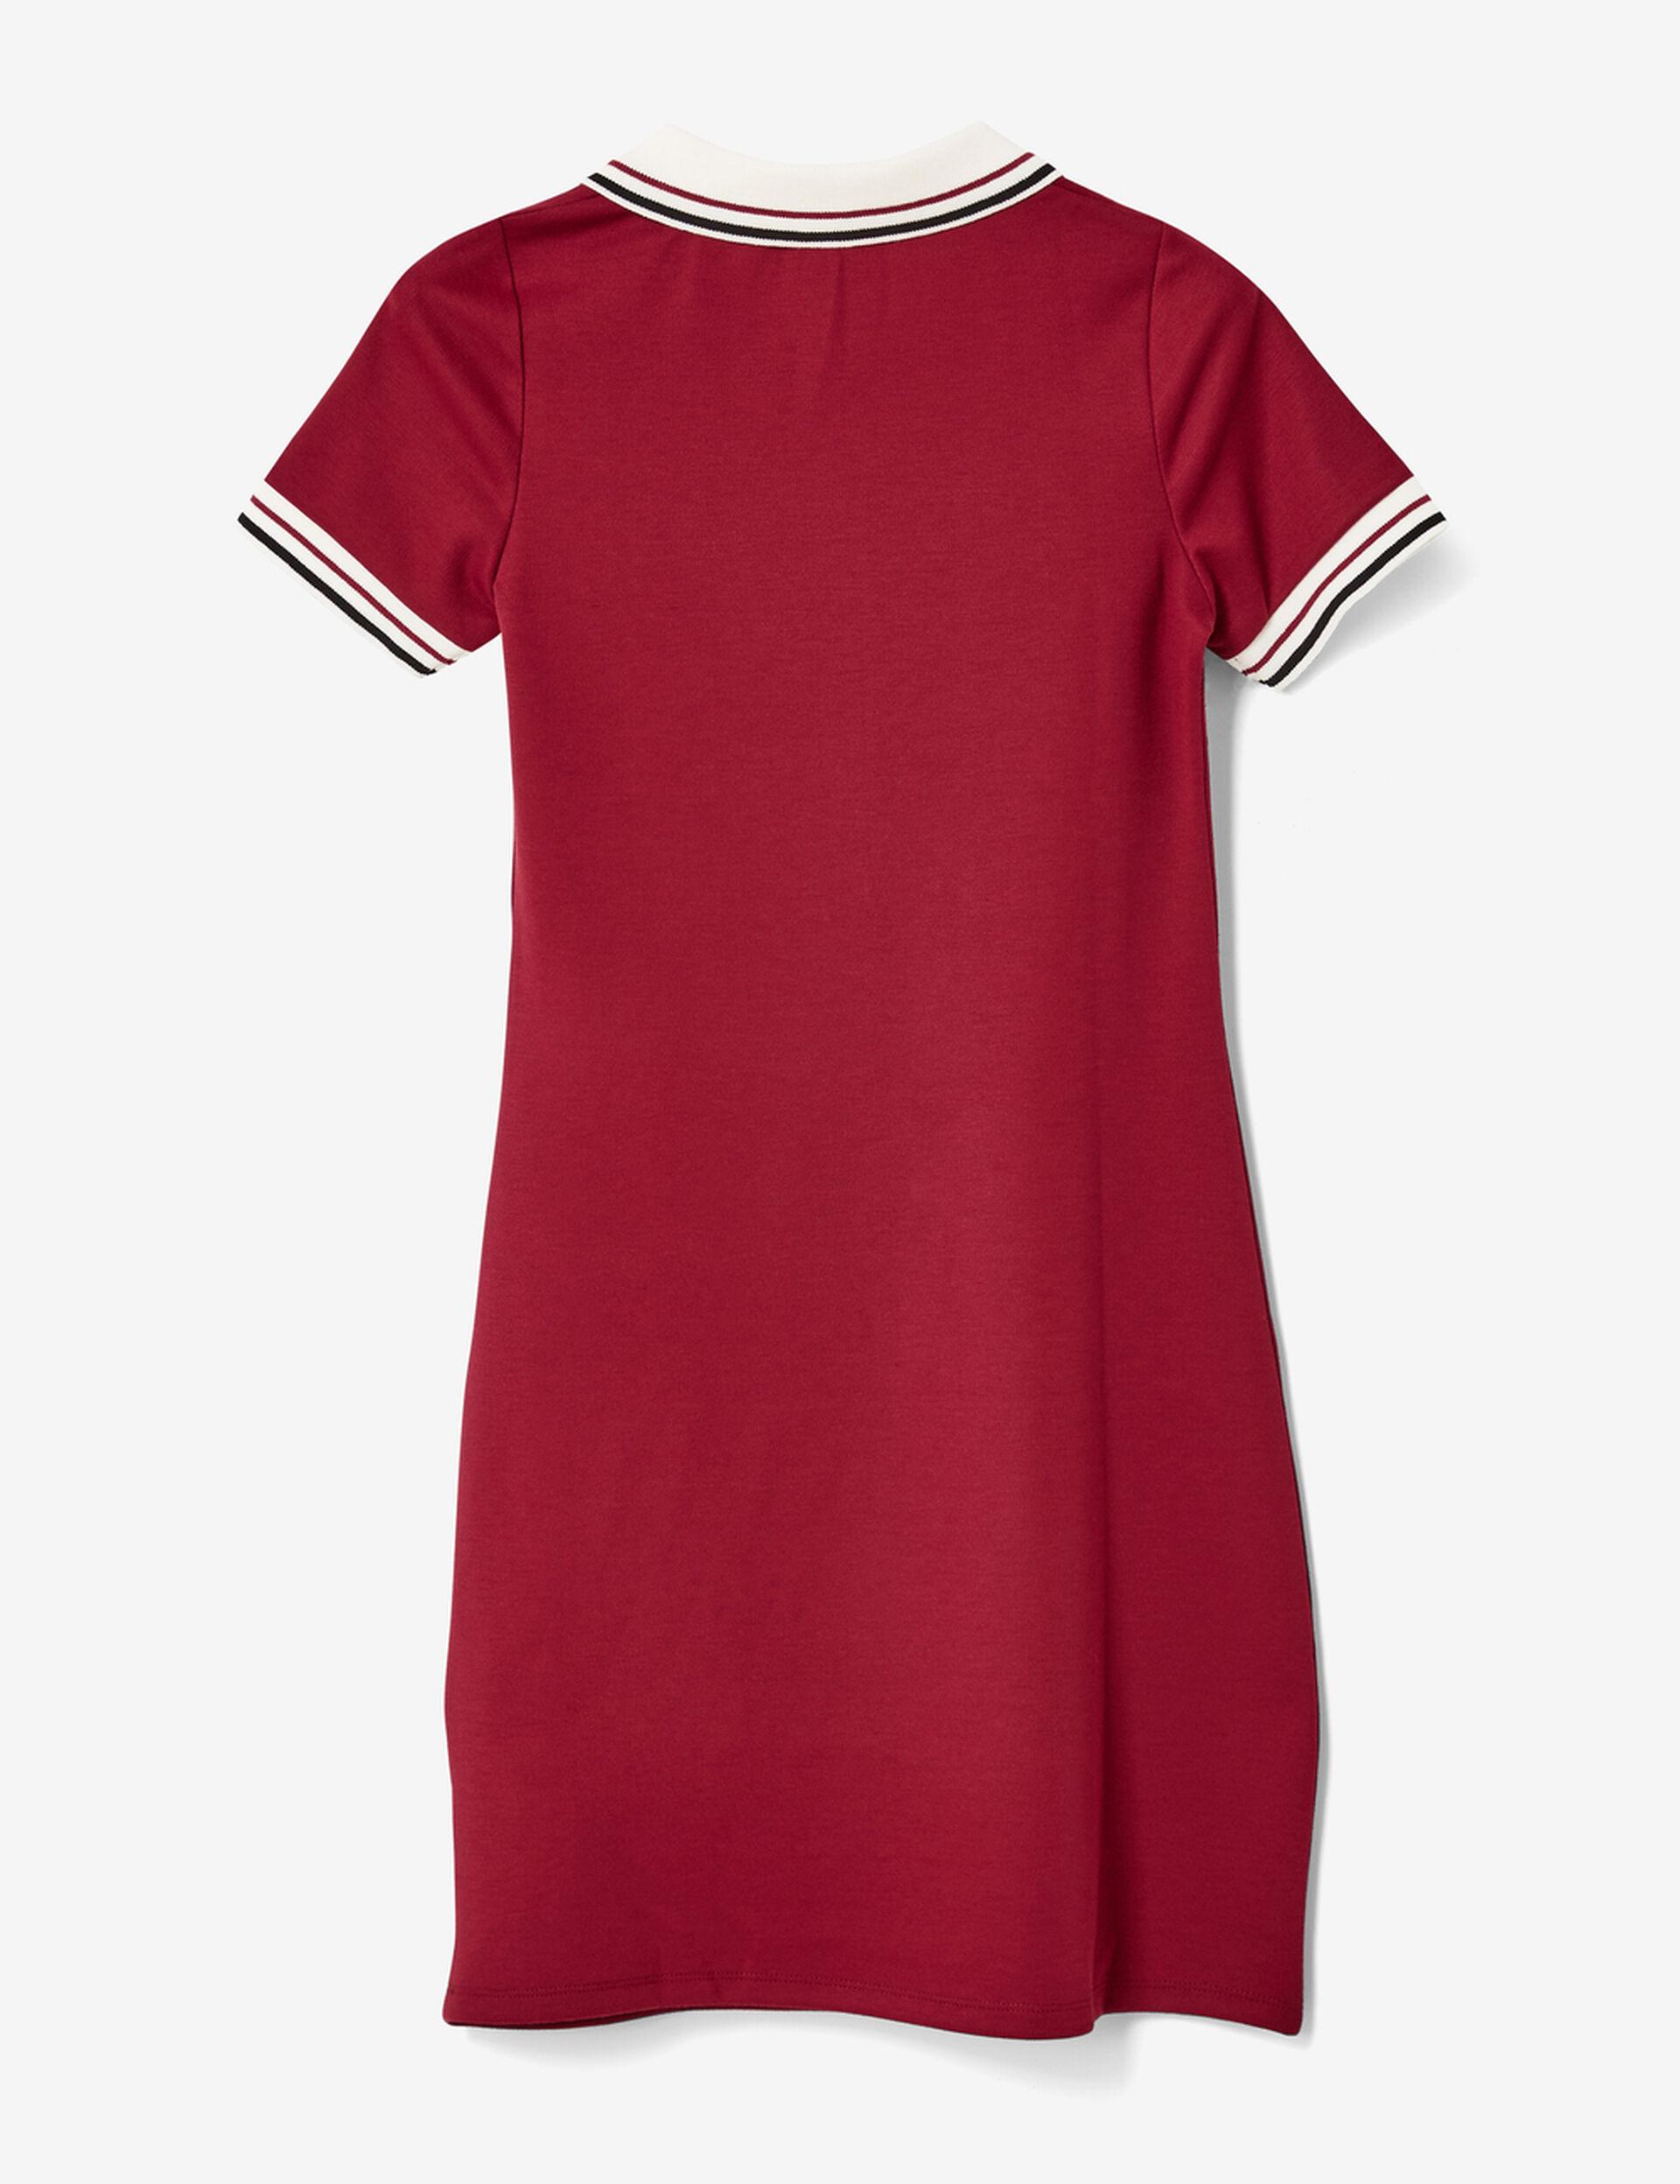 Burgundy zipped polo shirt dress